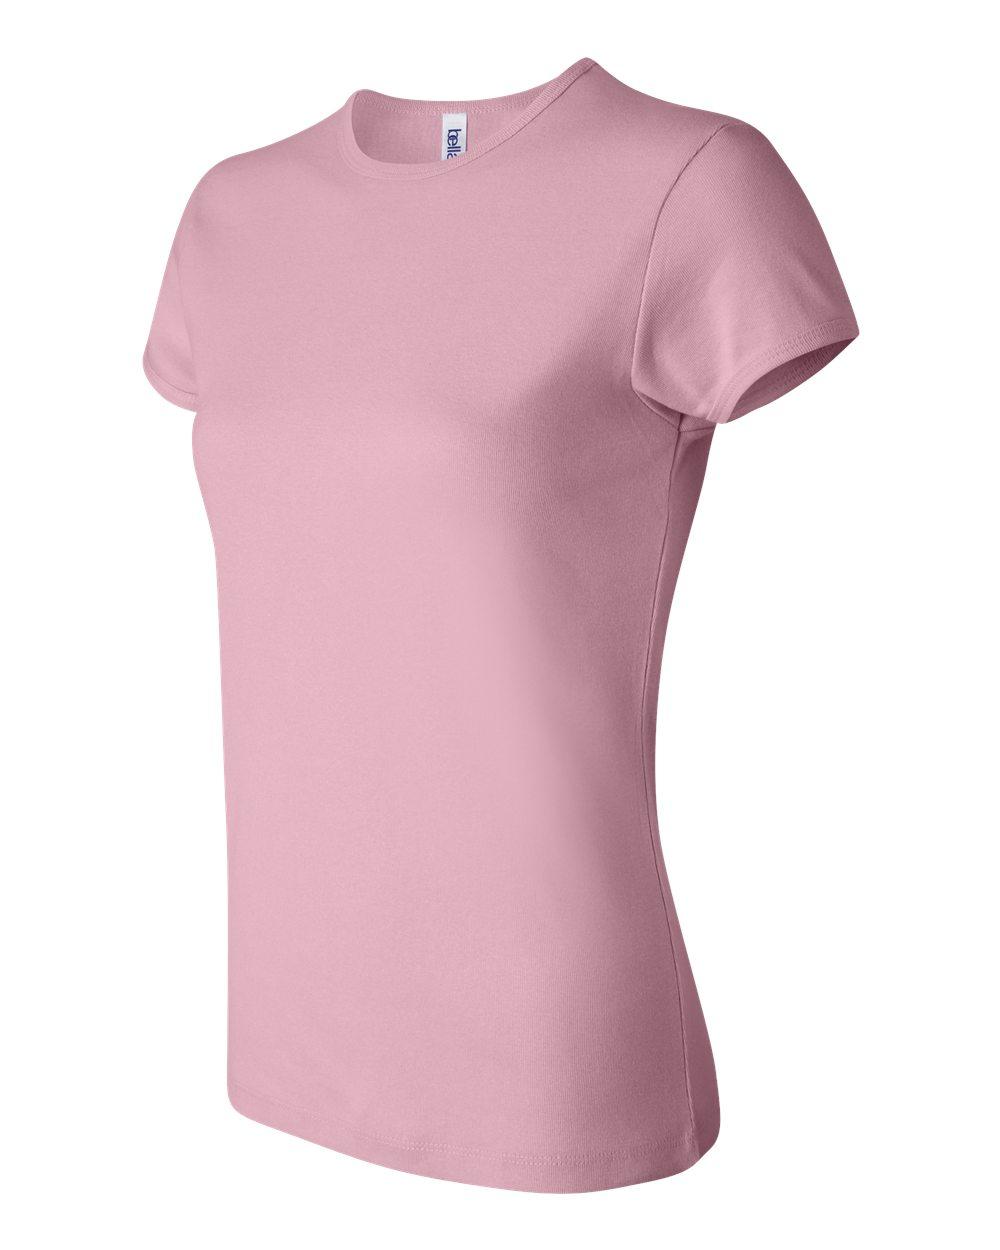 Bella 1001 Pink